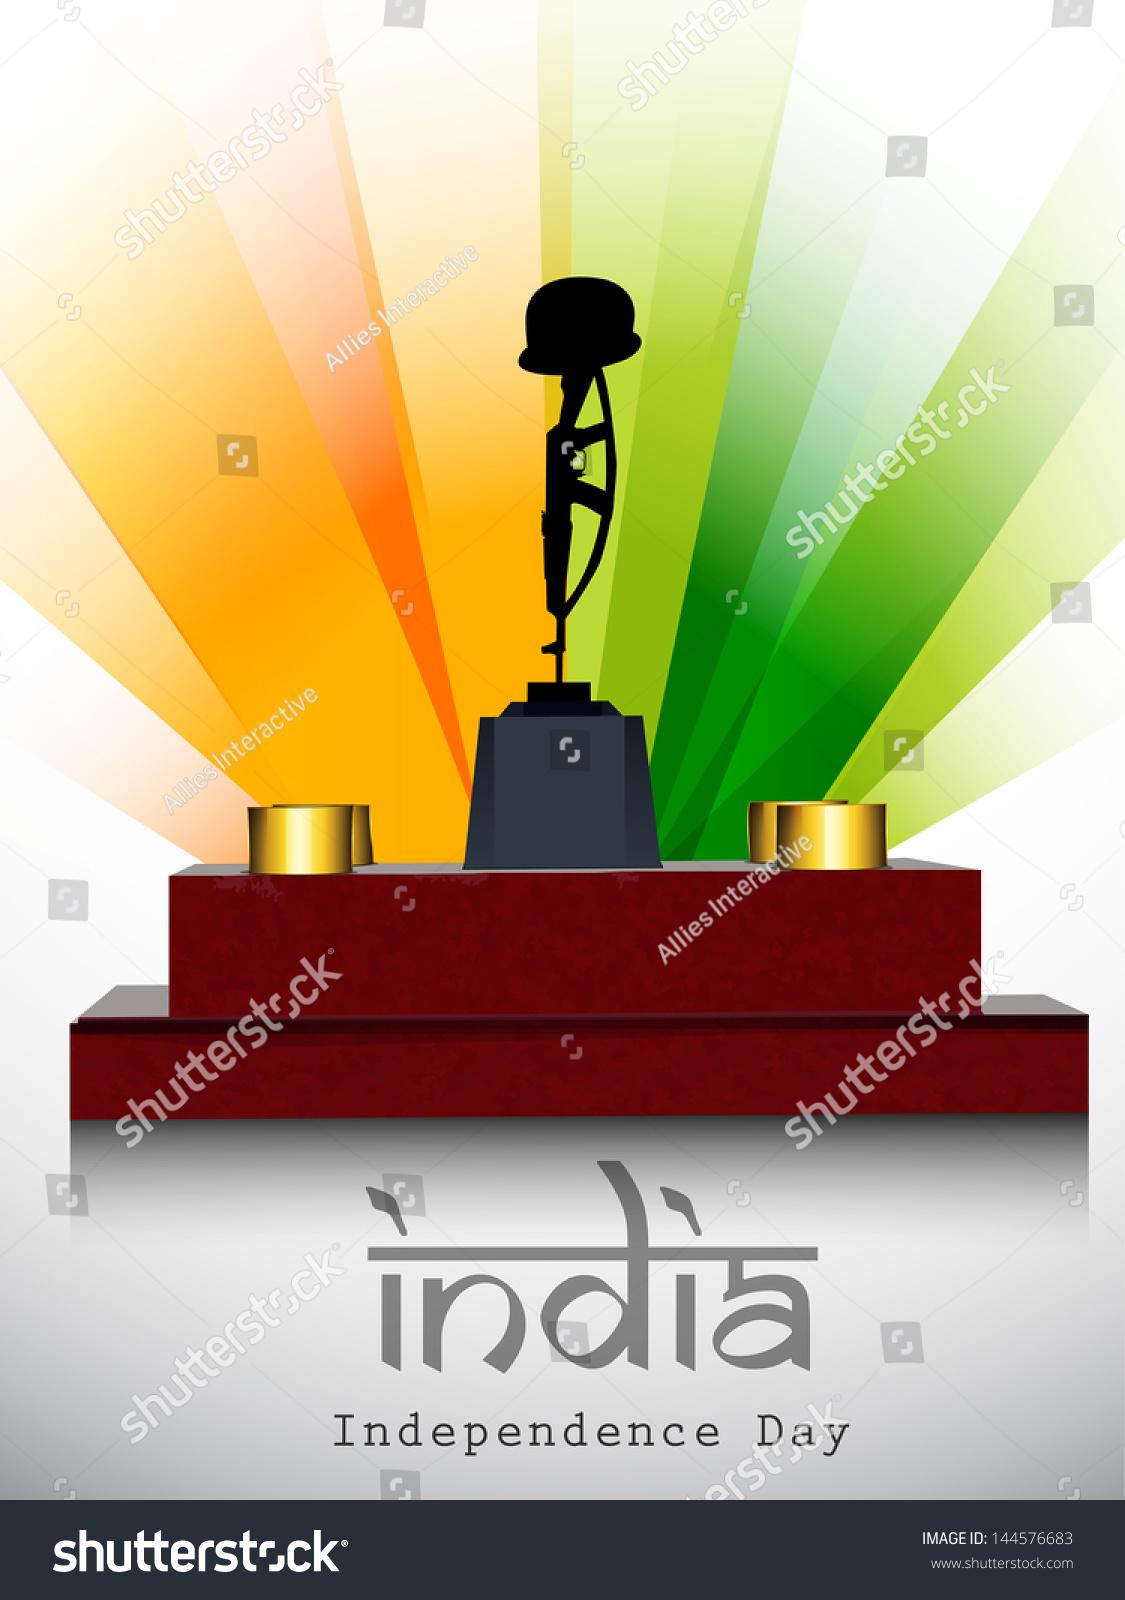 Indian independence day background amar jawan stock vector 144576683 indian independence day background with amar jawan jyoti on national flag rays background altavistaventures Image collections